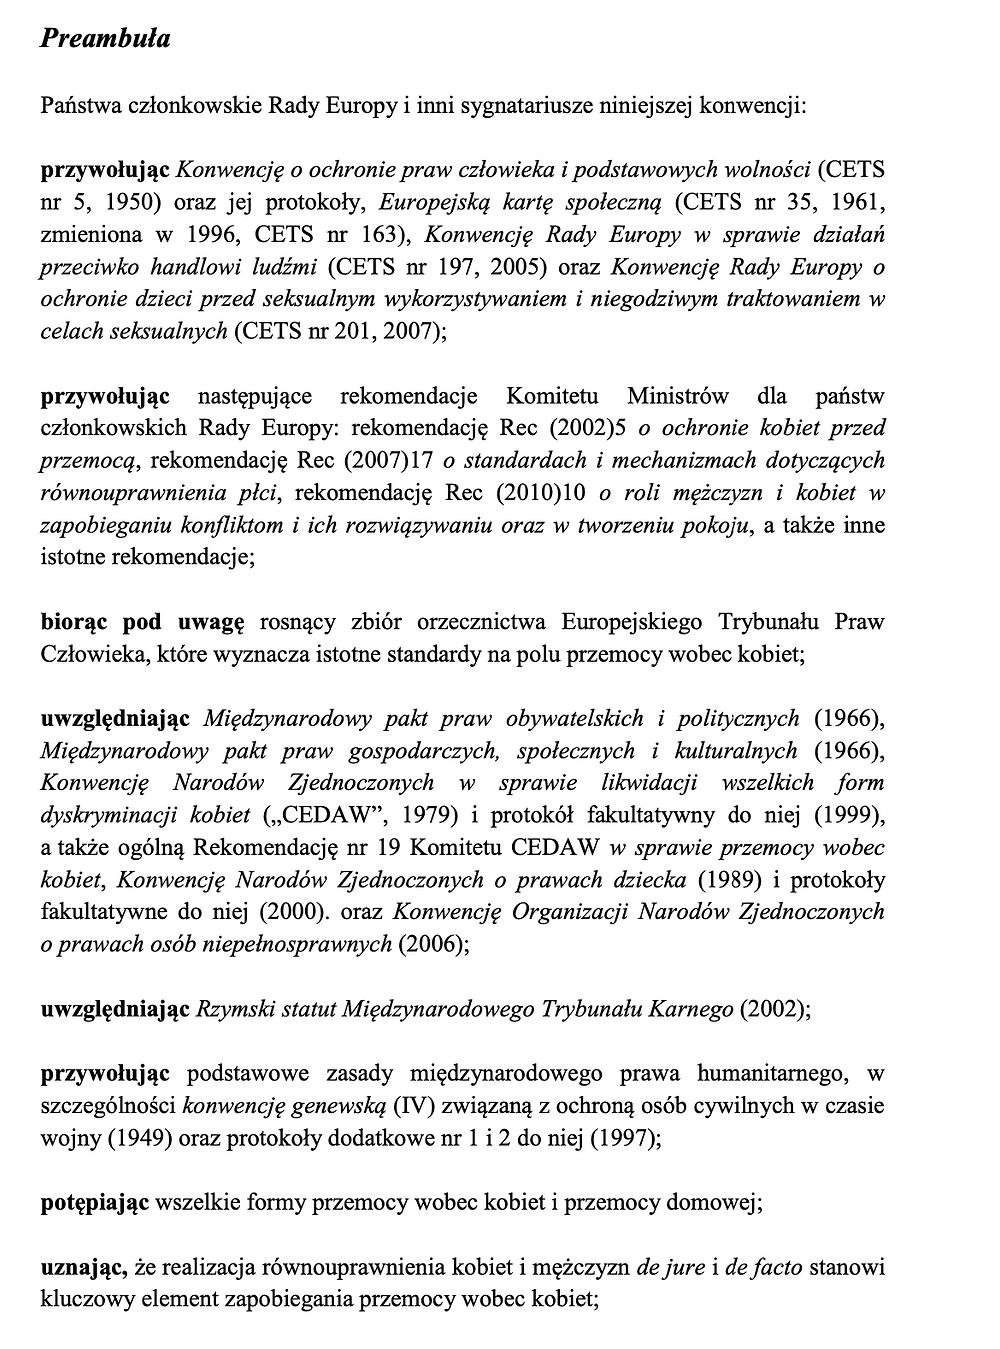 stalking.org.pl, stalking, informacje, pomoc prawna